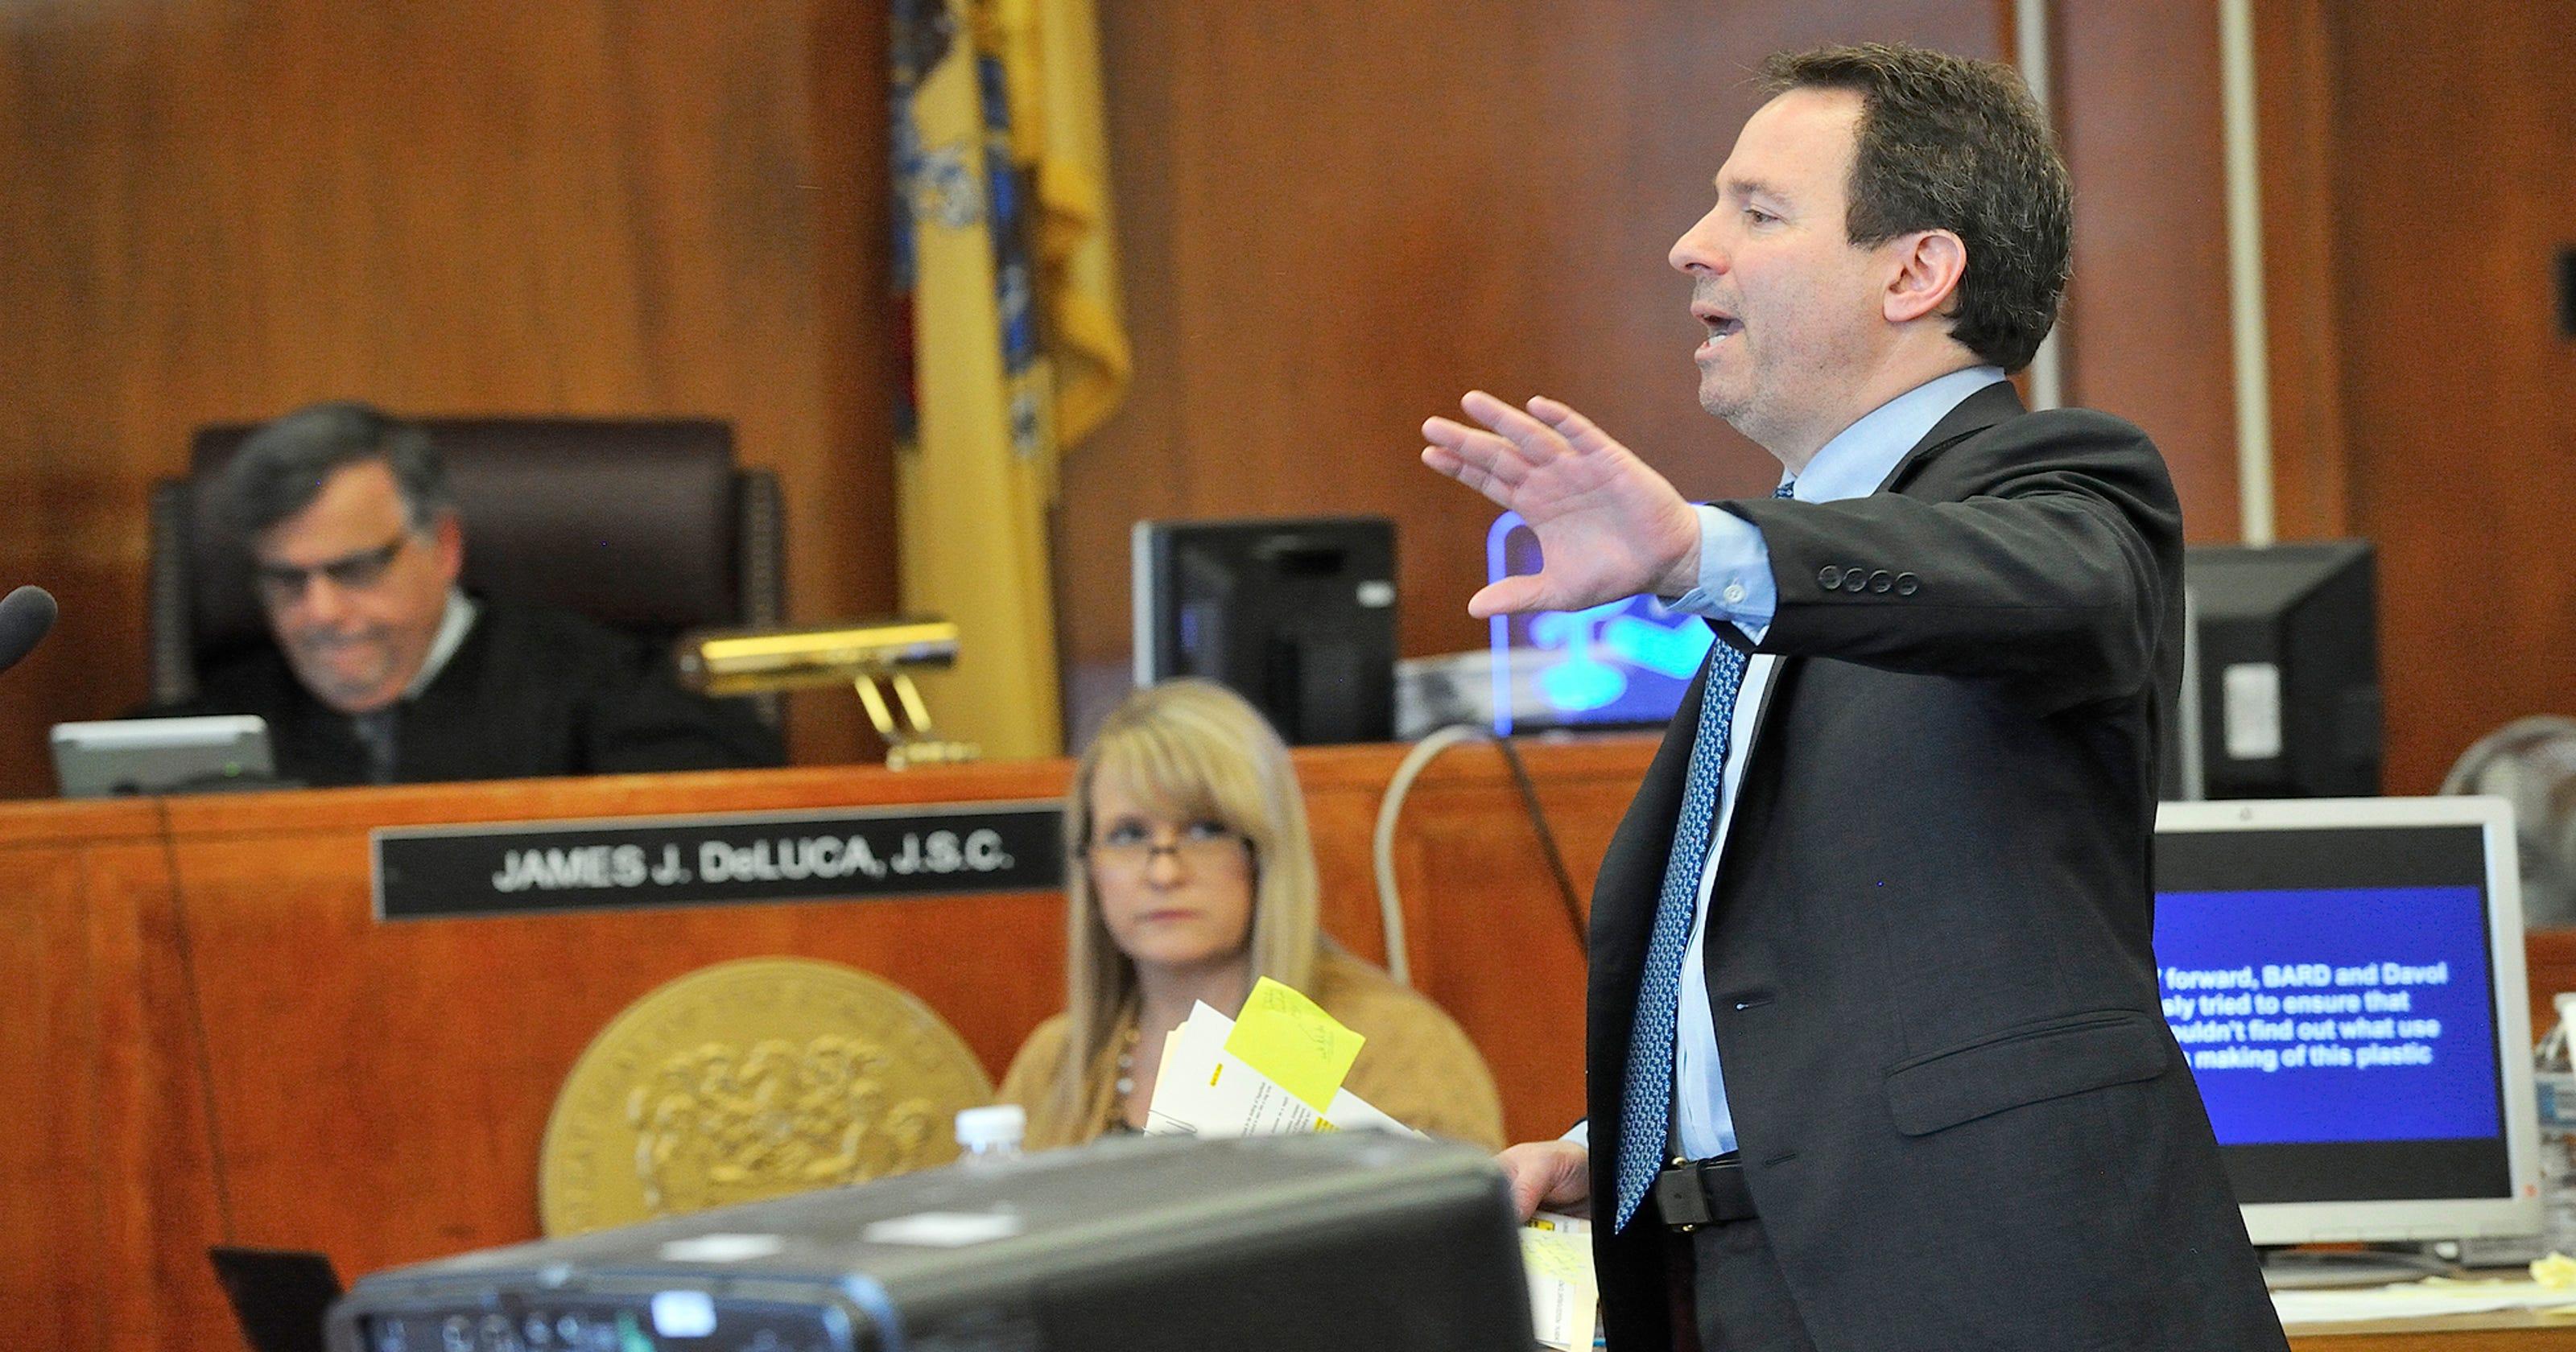 Bergen jury awards $68 million in damages in C.R. Bard mesh case